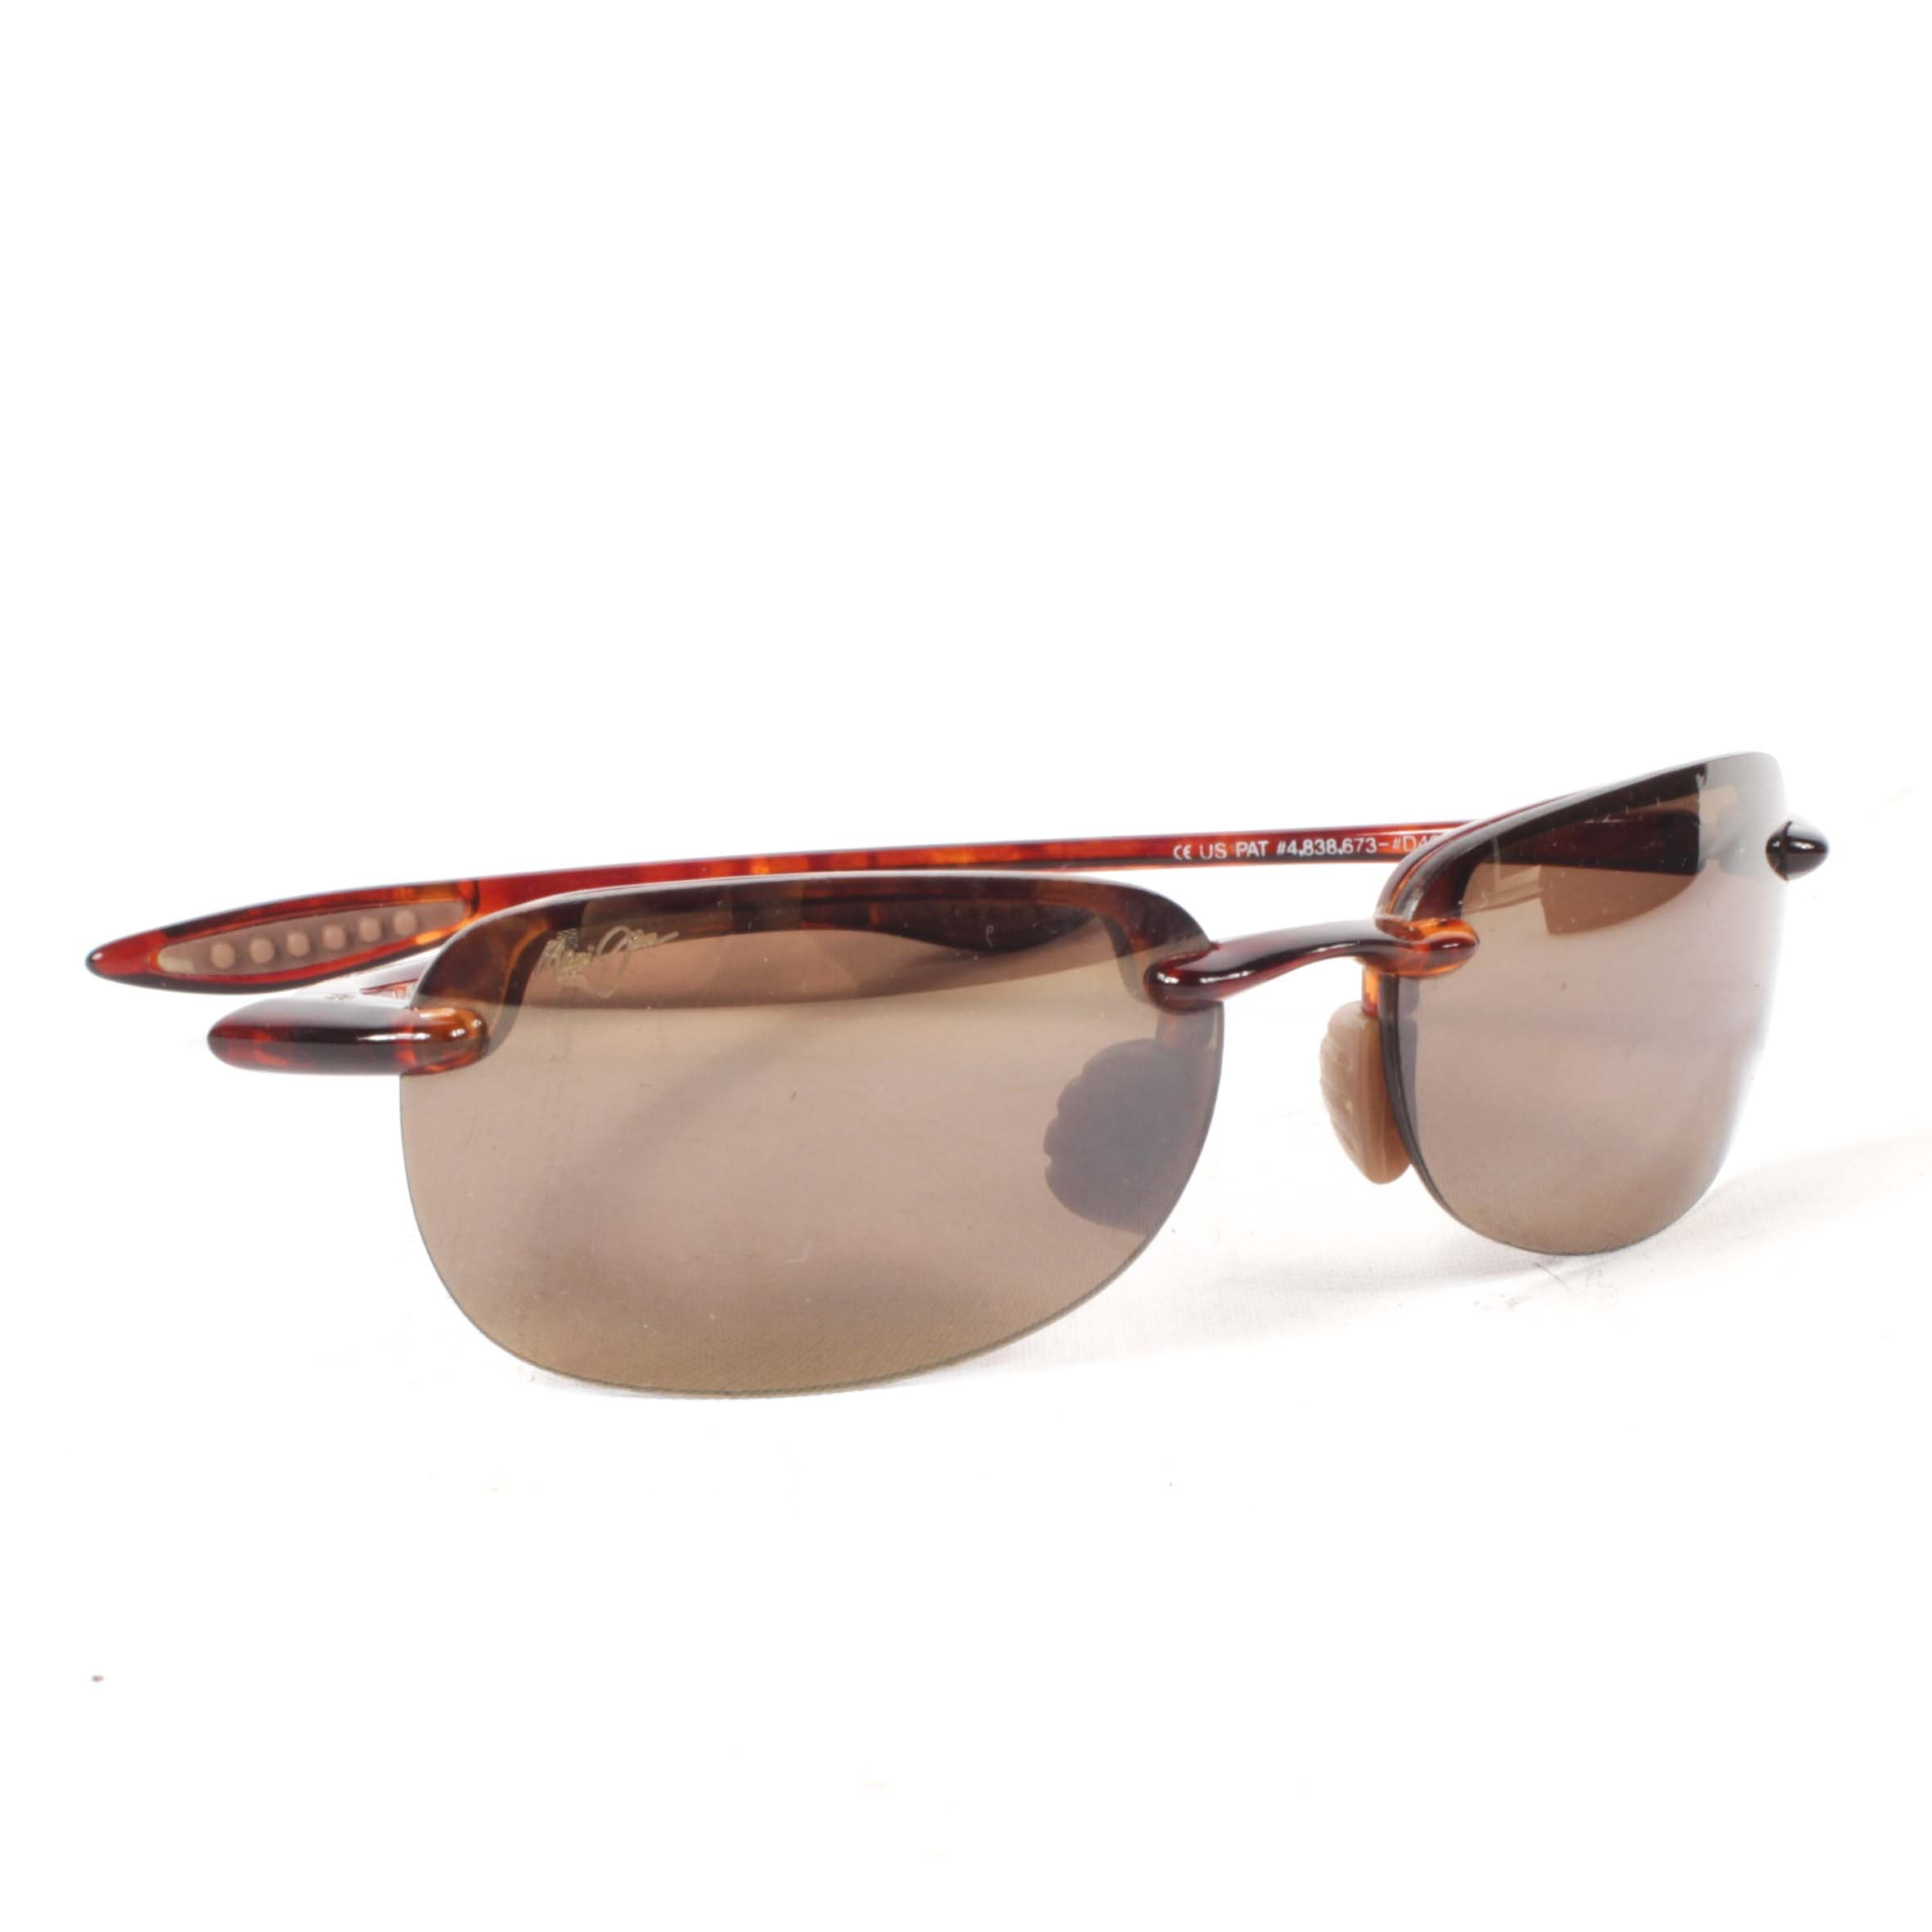 Maui Jim MJ Sport Sunglasses with Case